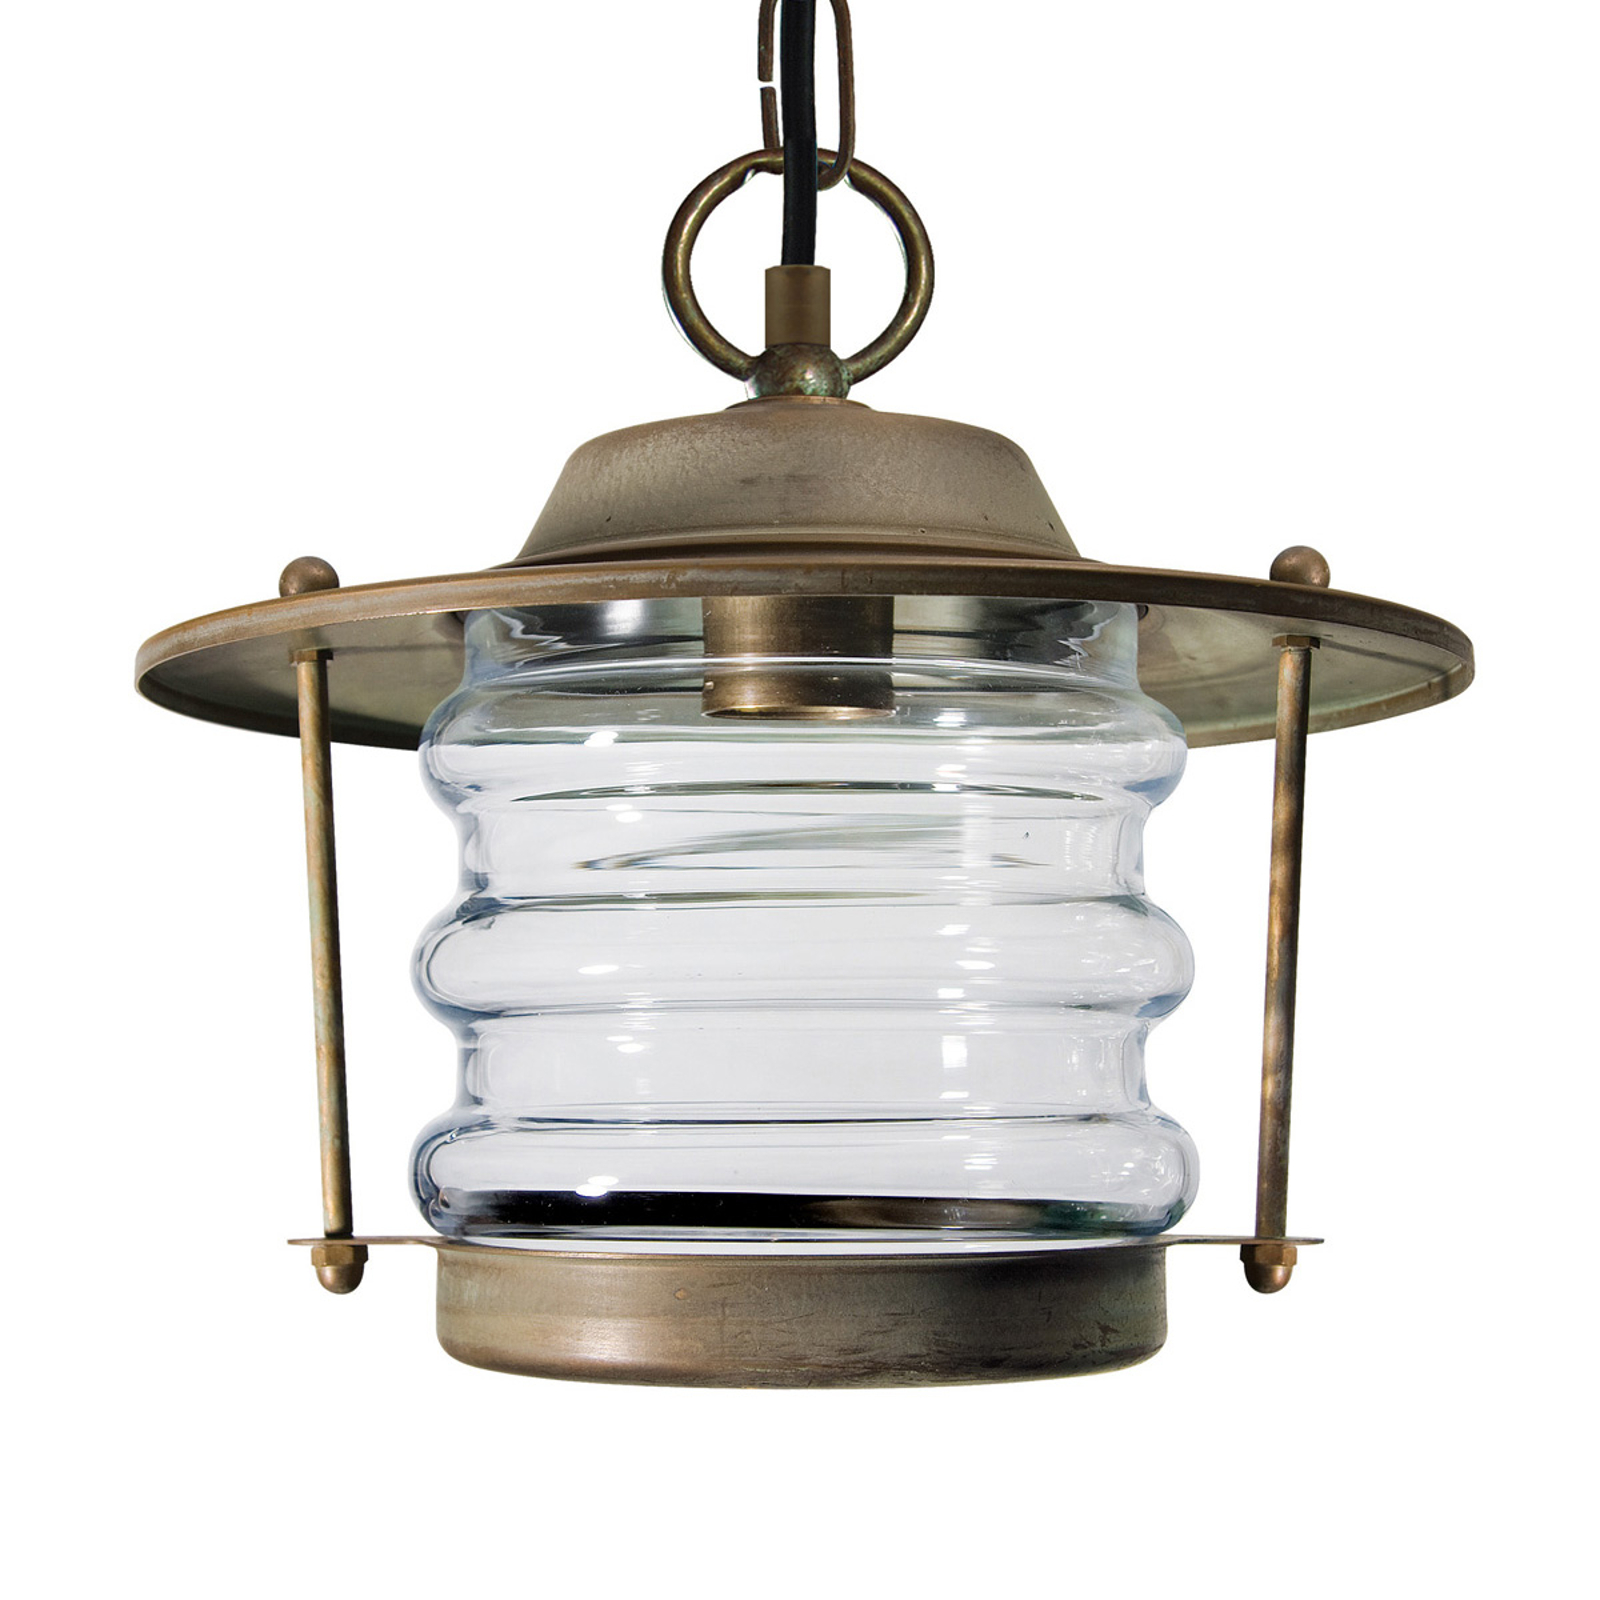 Lantaarn hanglamp Adessora zeewaterbestendig